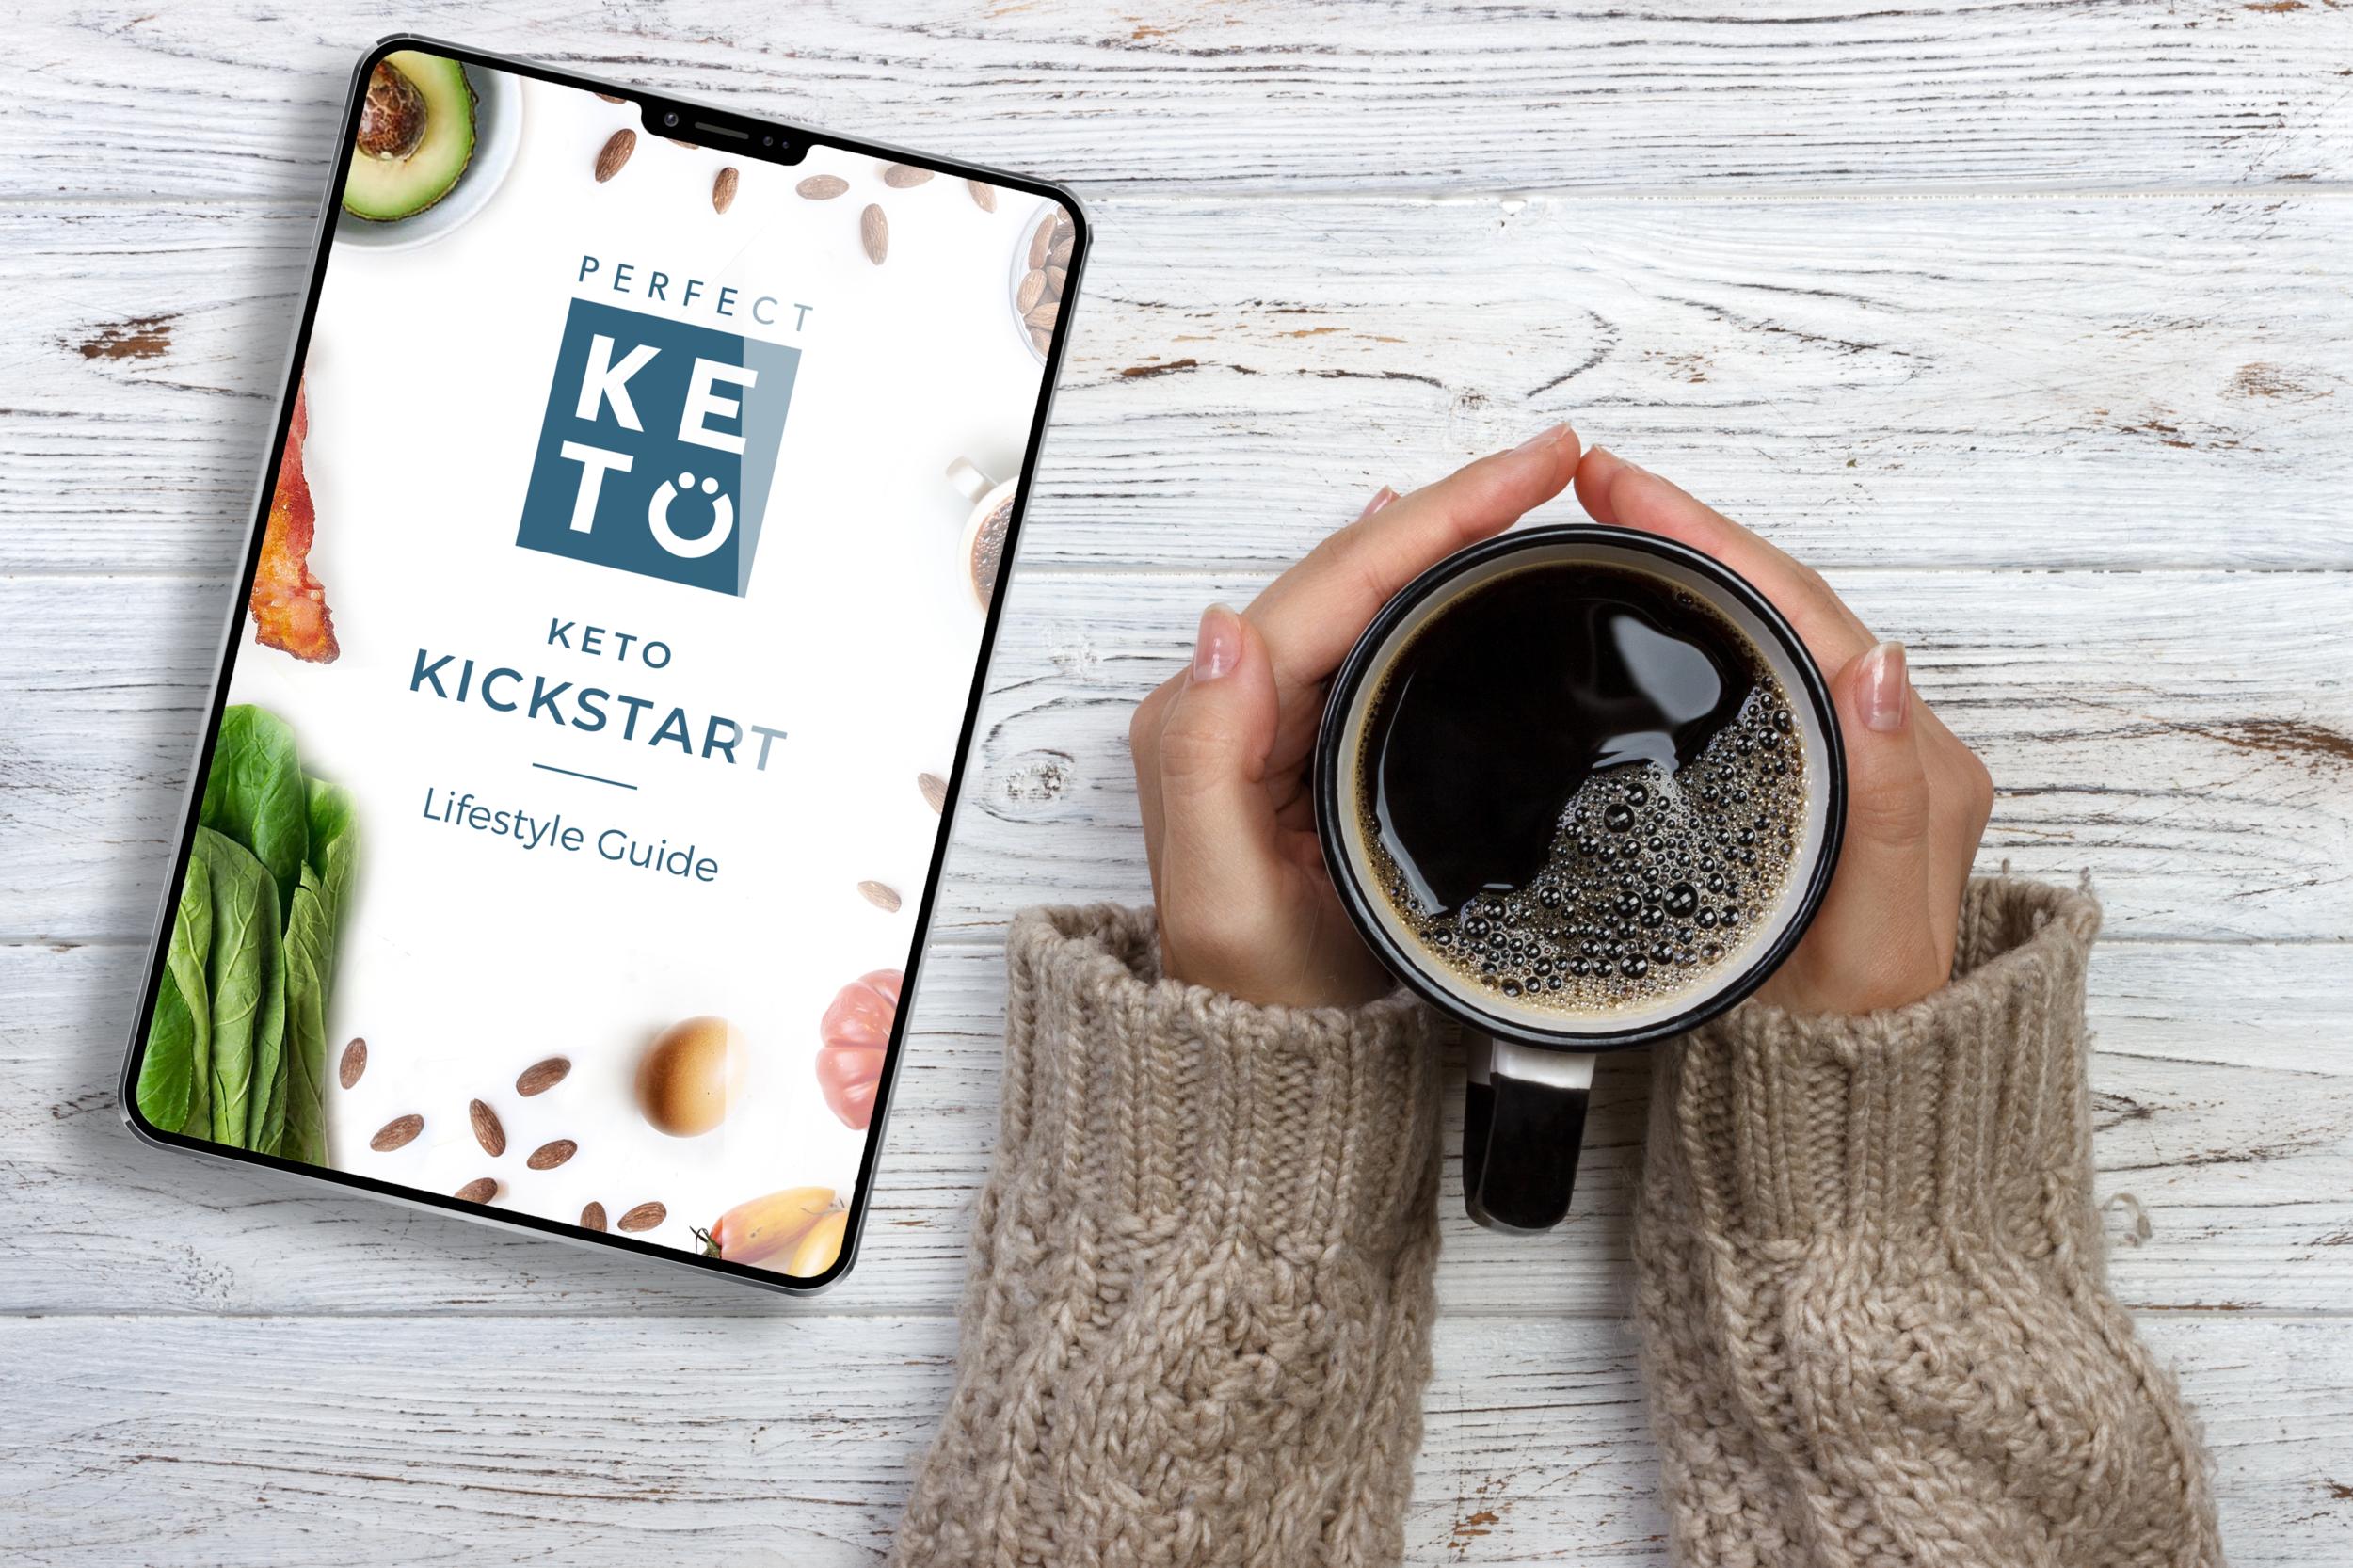 kickstart perfect keto kitc